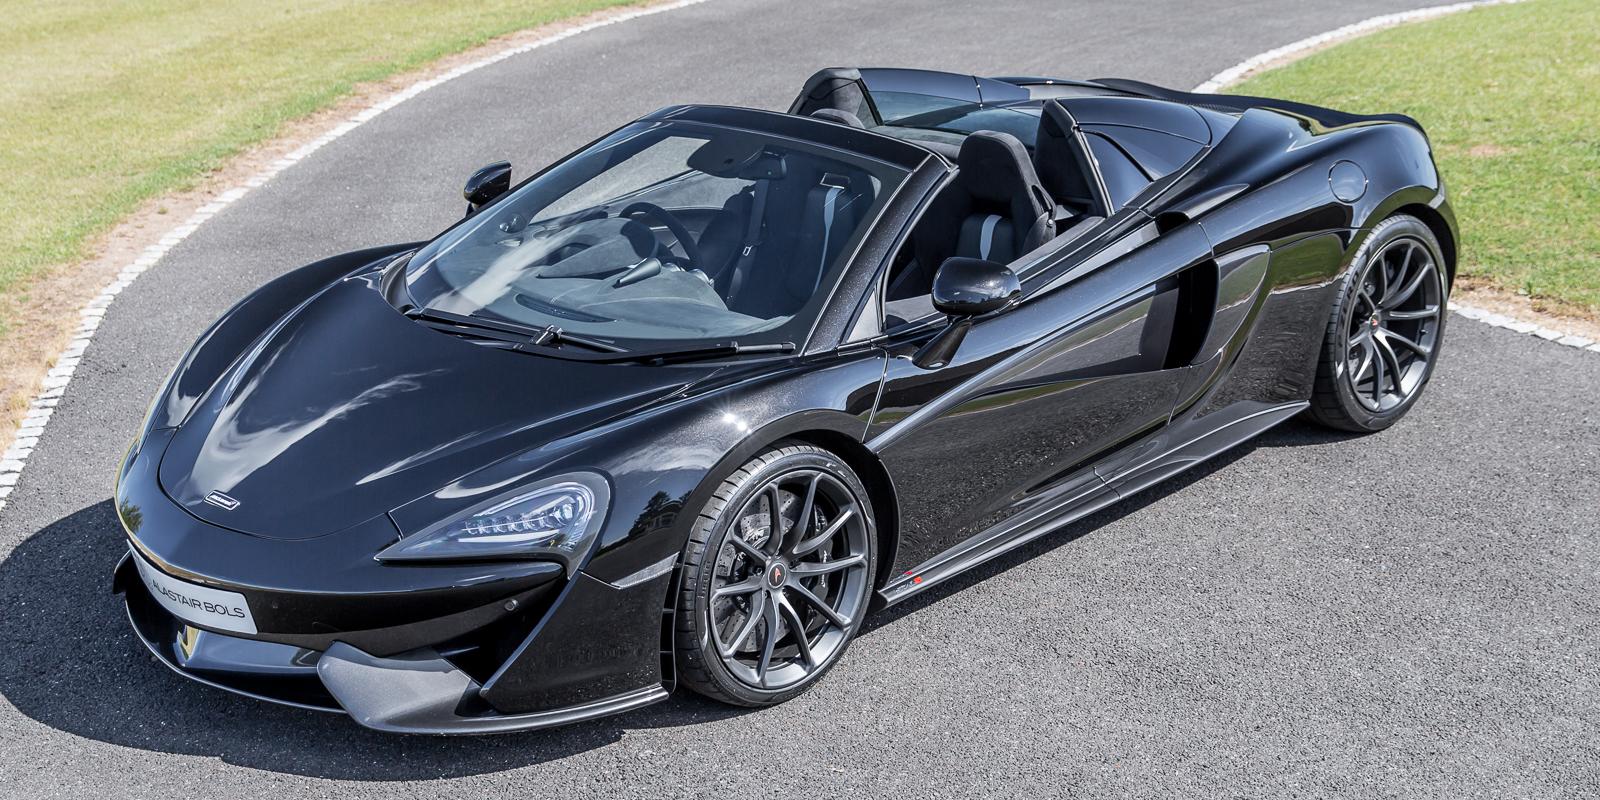 McLaren 570S Spider – ONYX BLACK